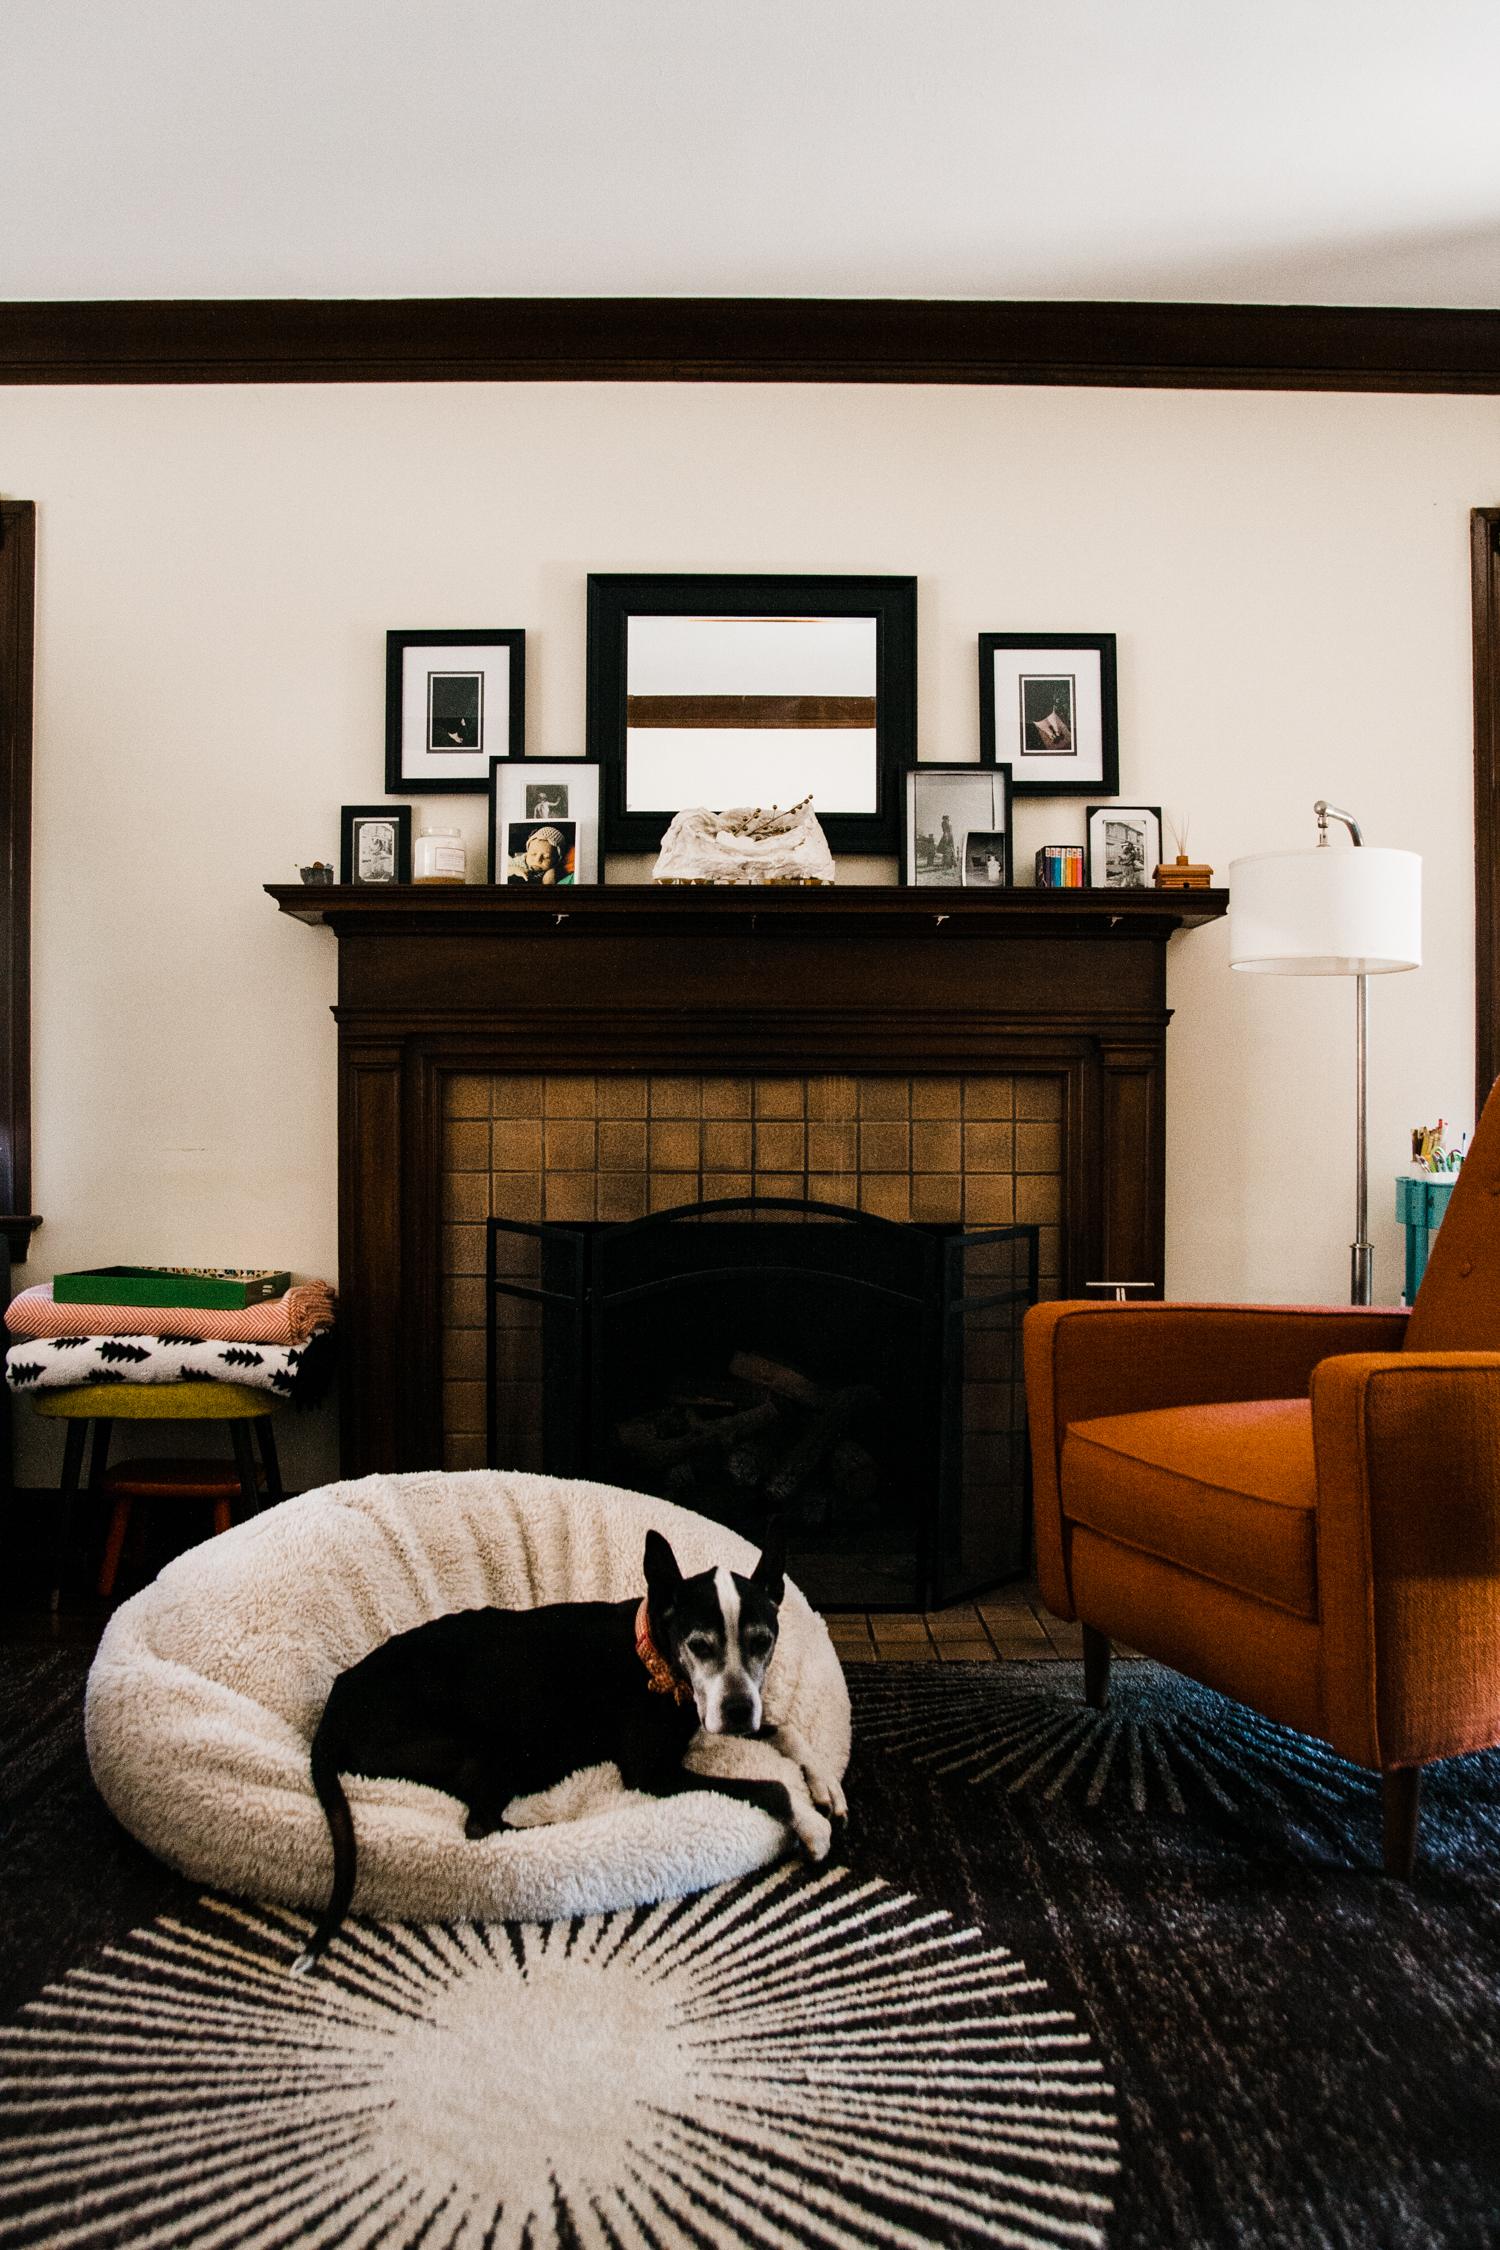 In Allison's modern tudor,    she kept with black frames for her living room, but varied the frames' sizes, widths, and matting.